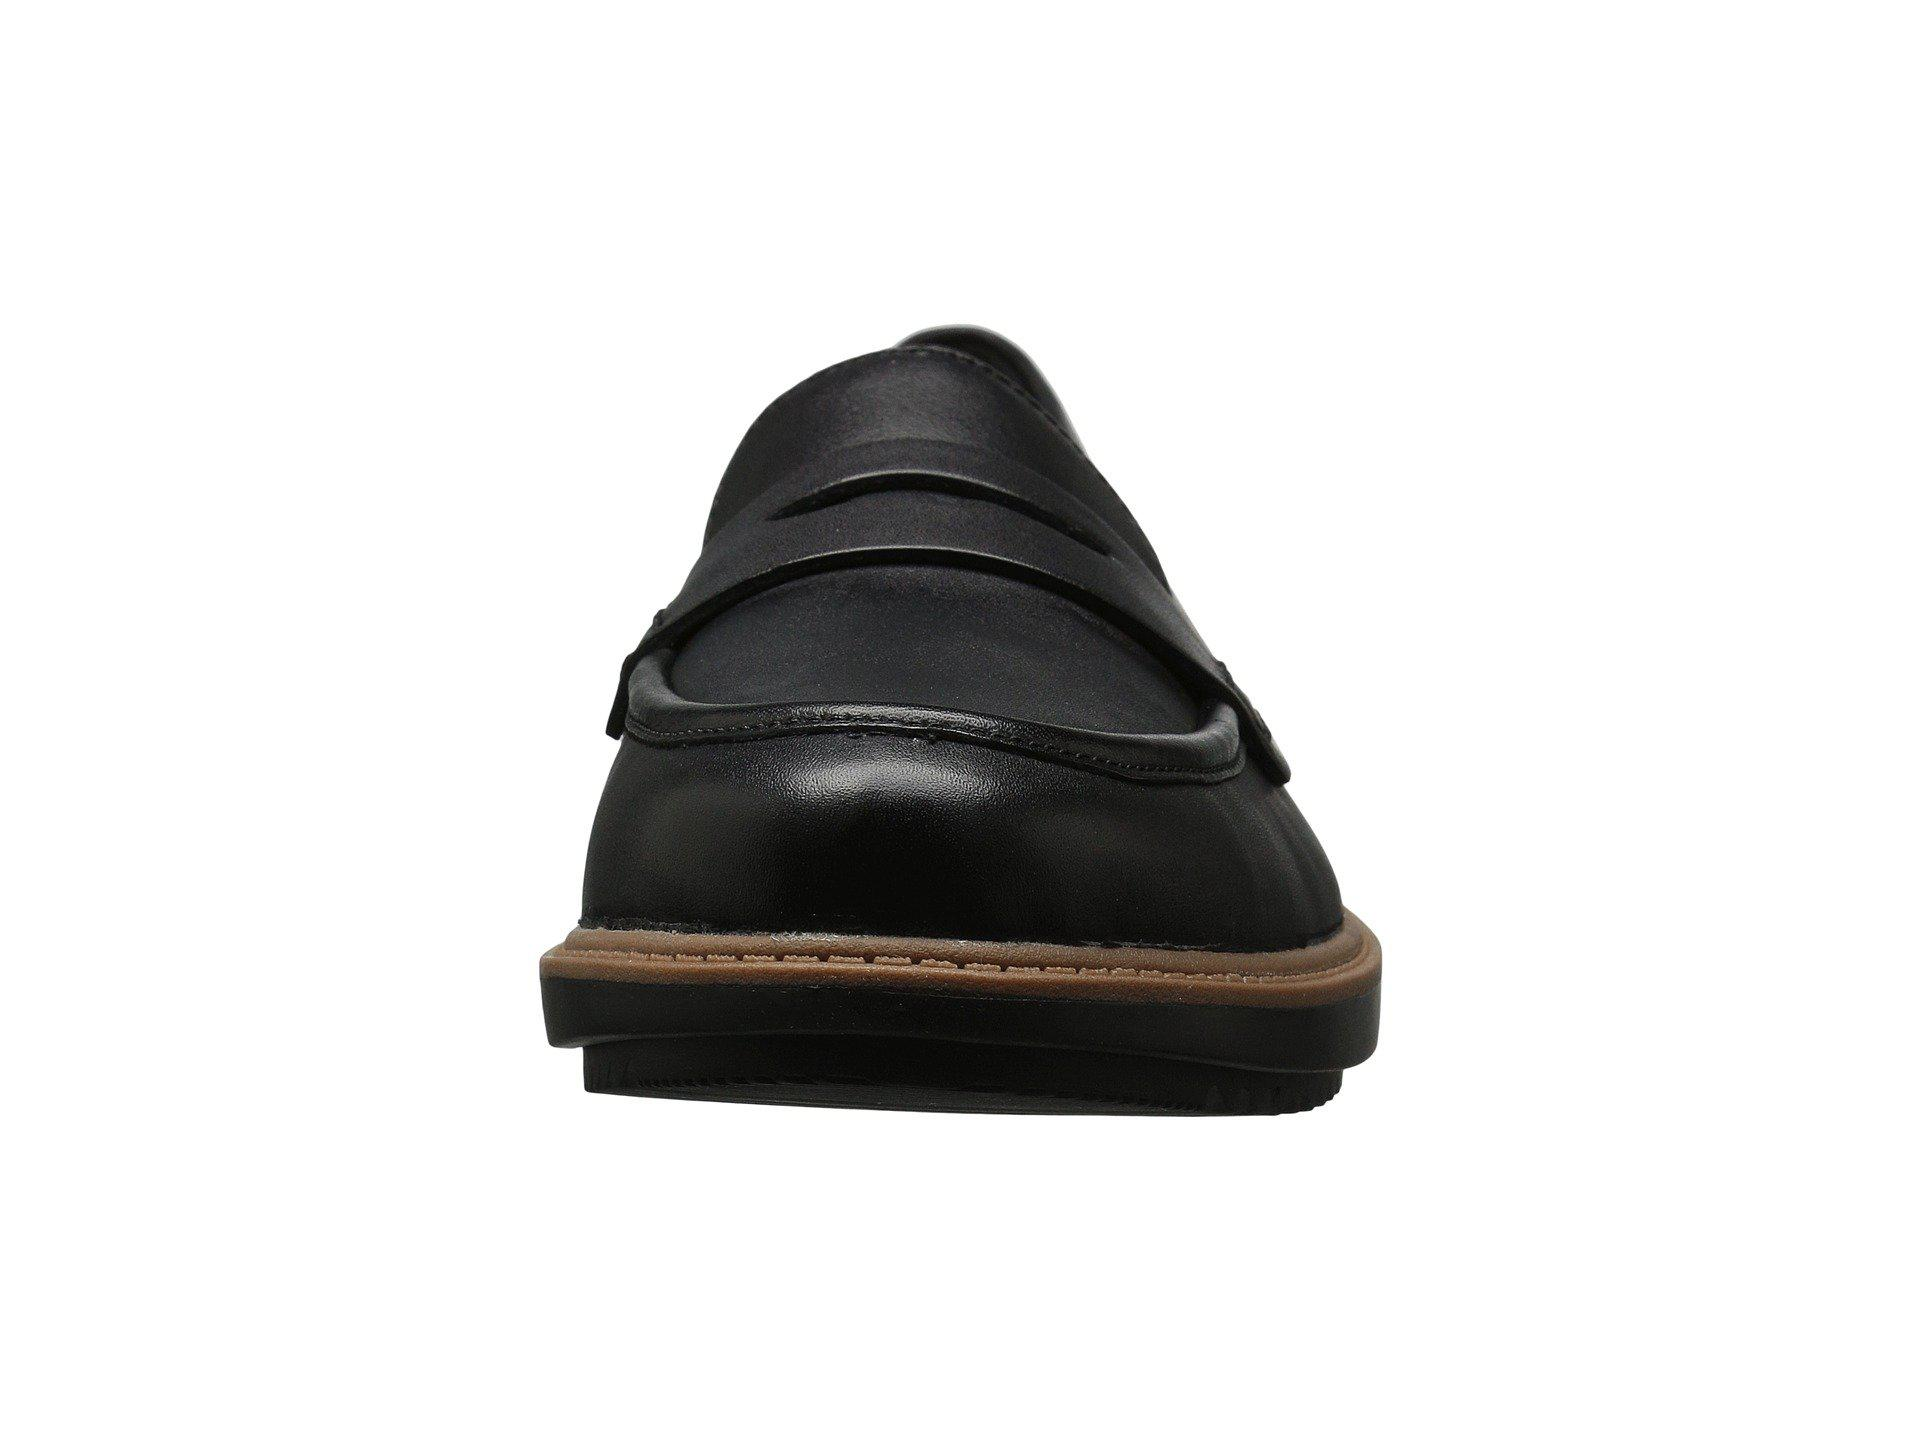 91ee0b8e83a Clarks - Raisie Eletta (black Leather) Women s Slip On Shoes - Lyst. View  fullscreen